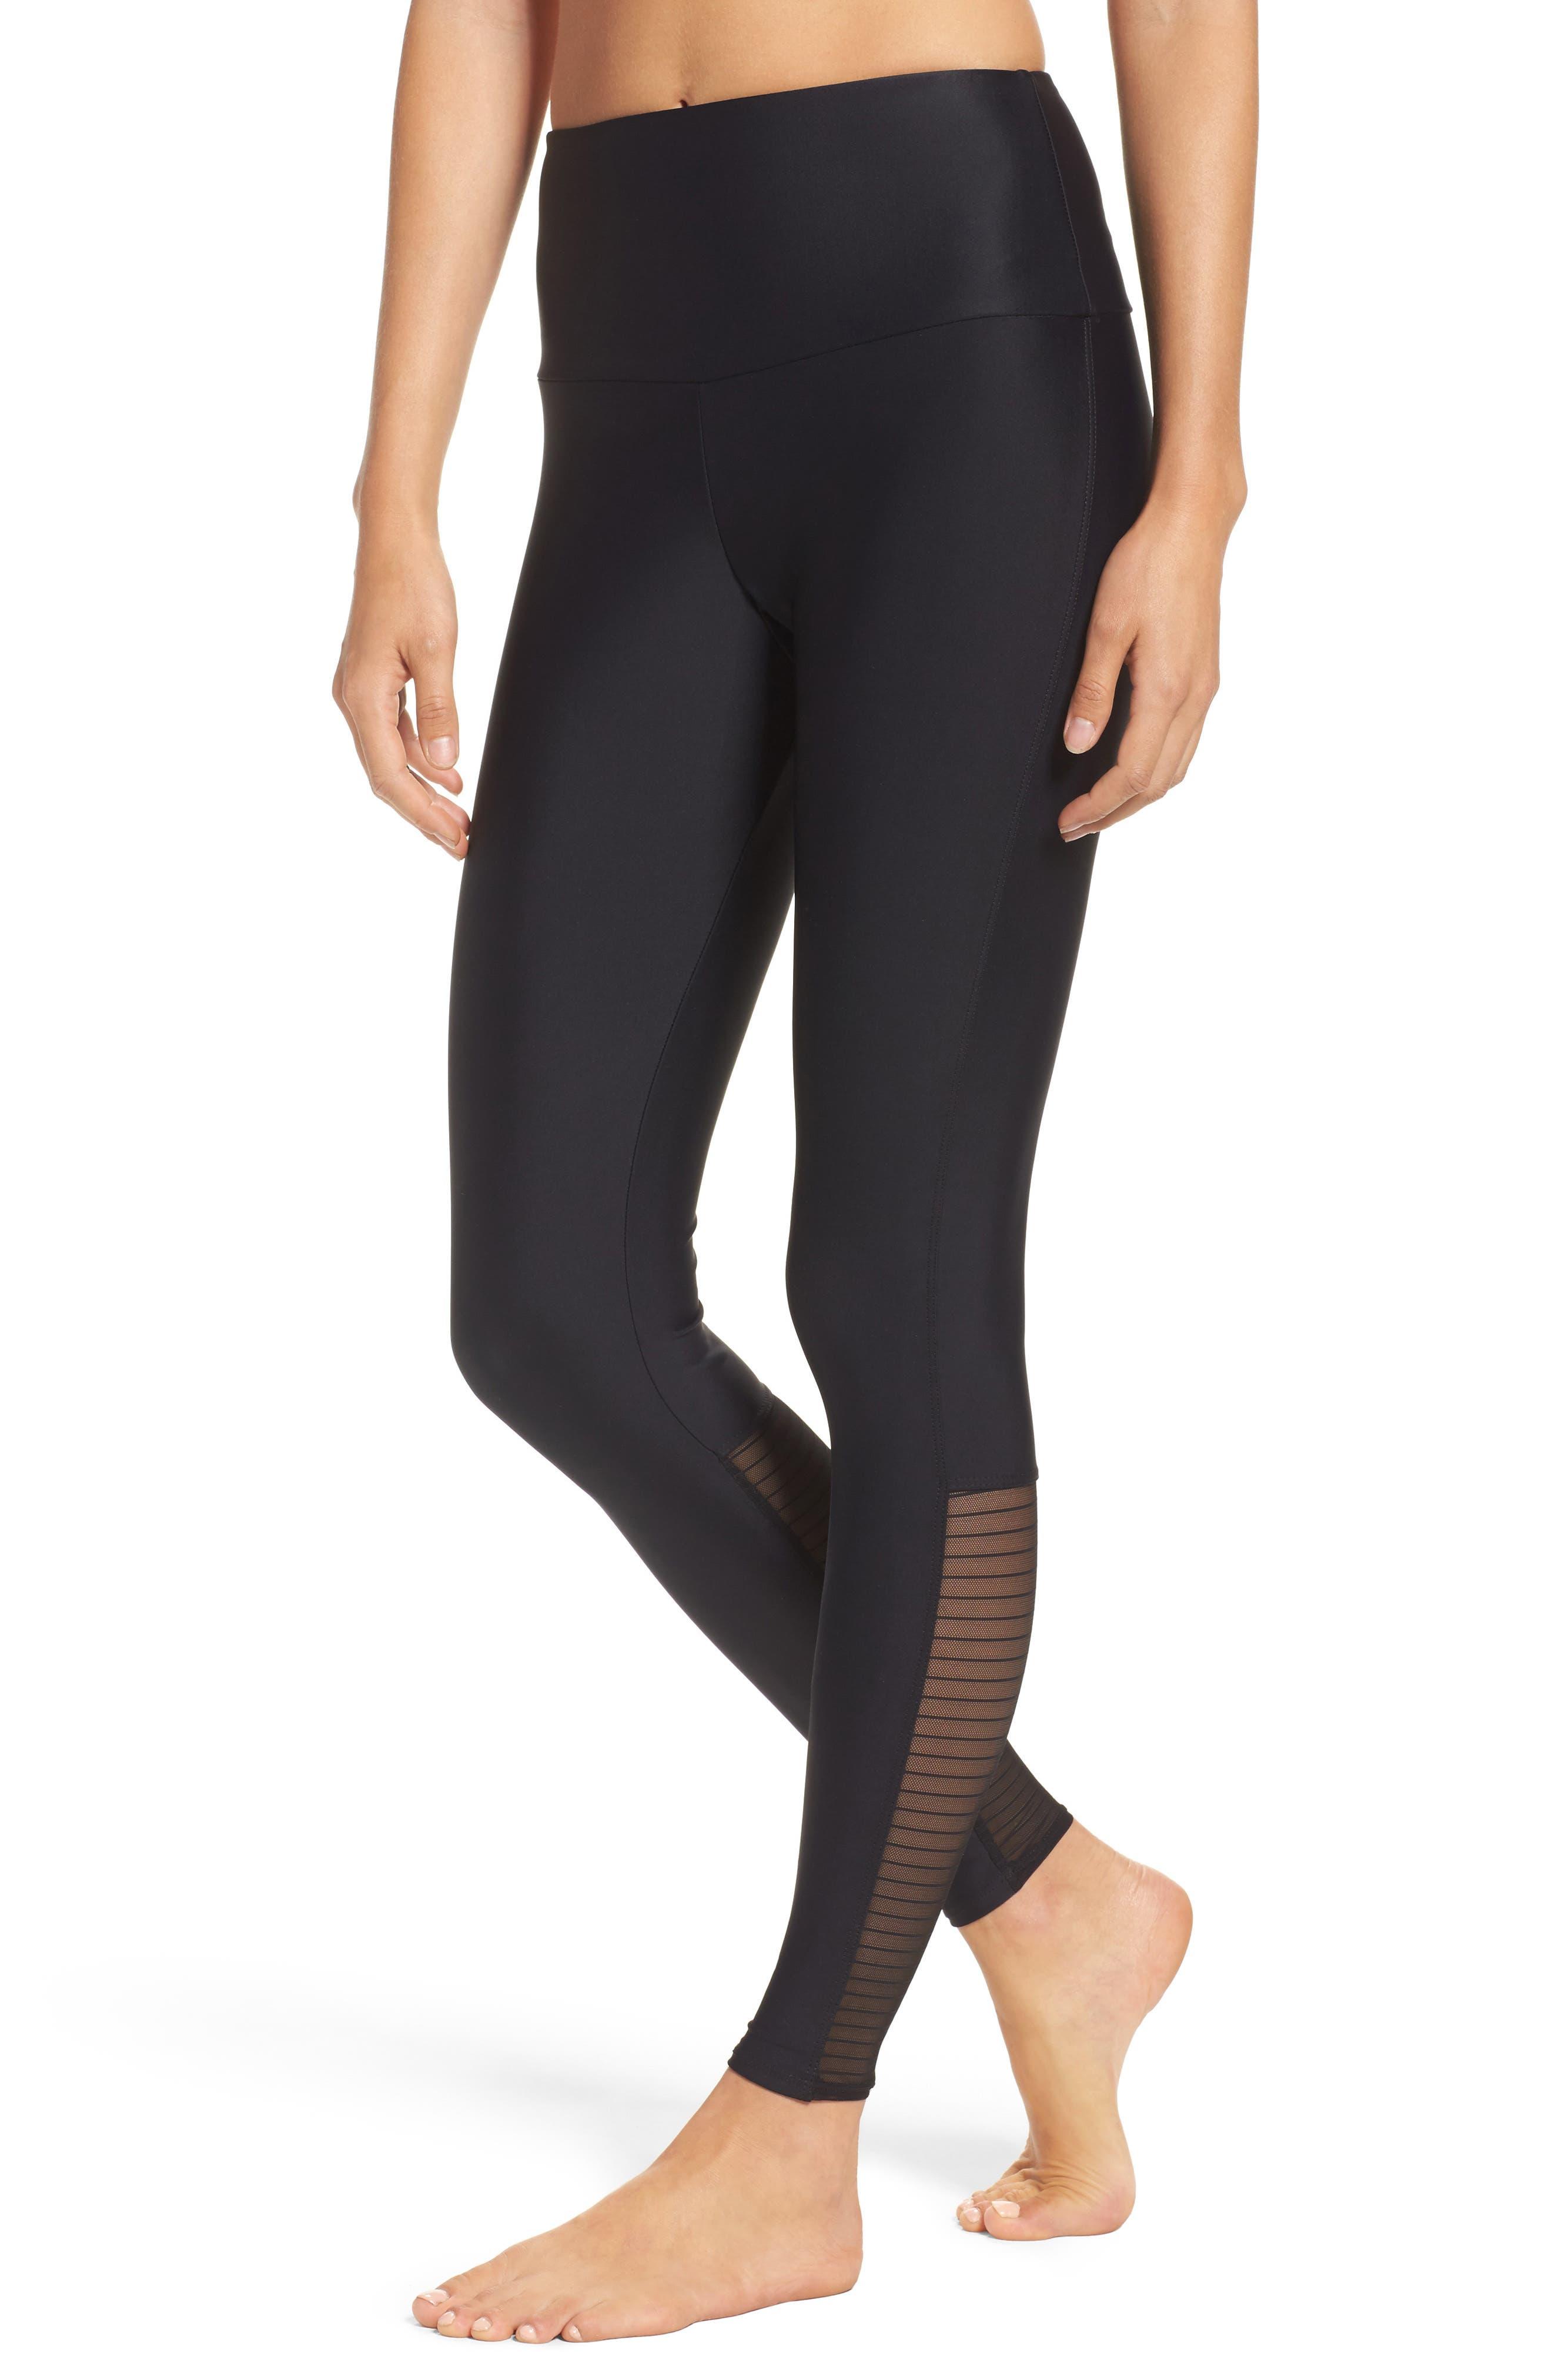 High Rise Yoga Pants,                             Main thumbnail 1, color,                             001